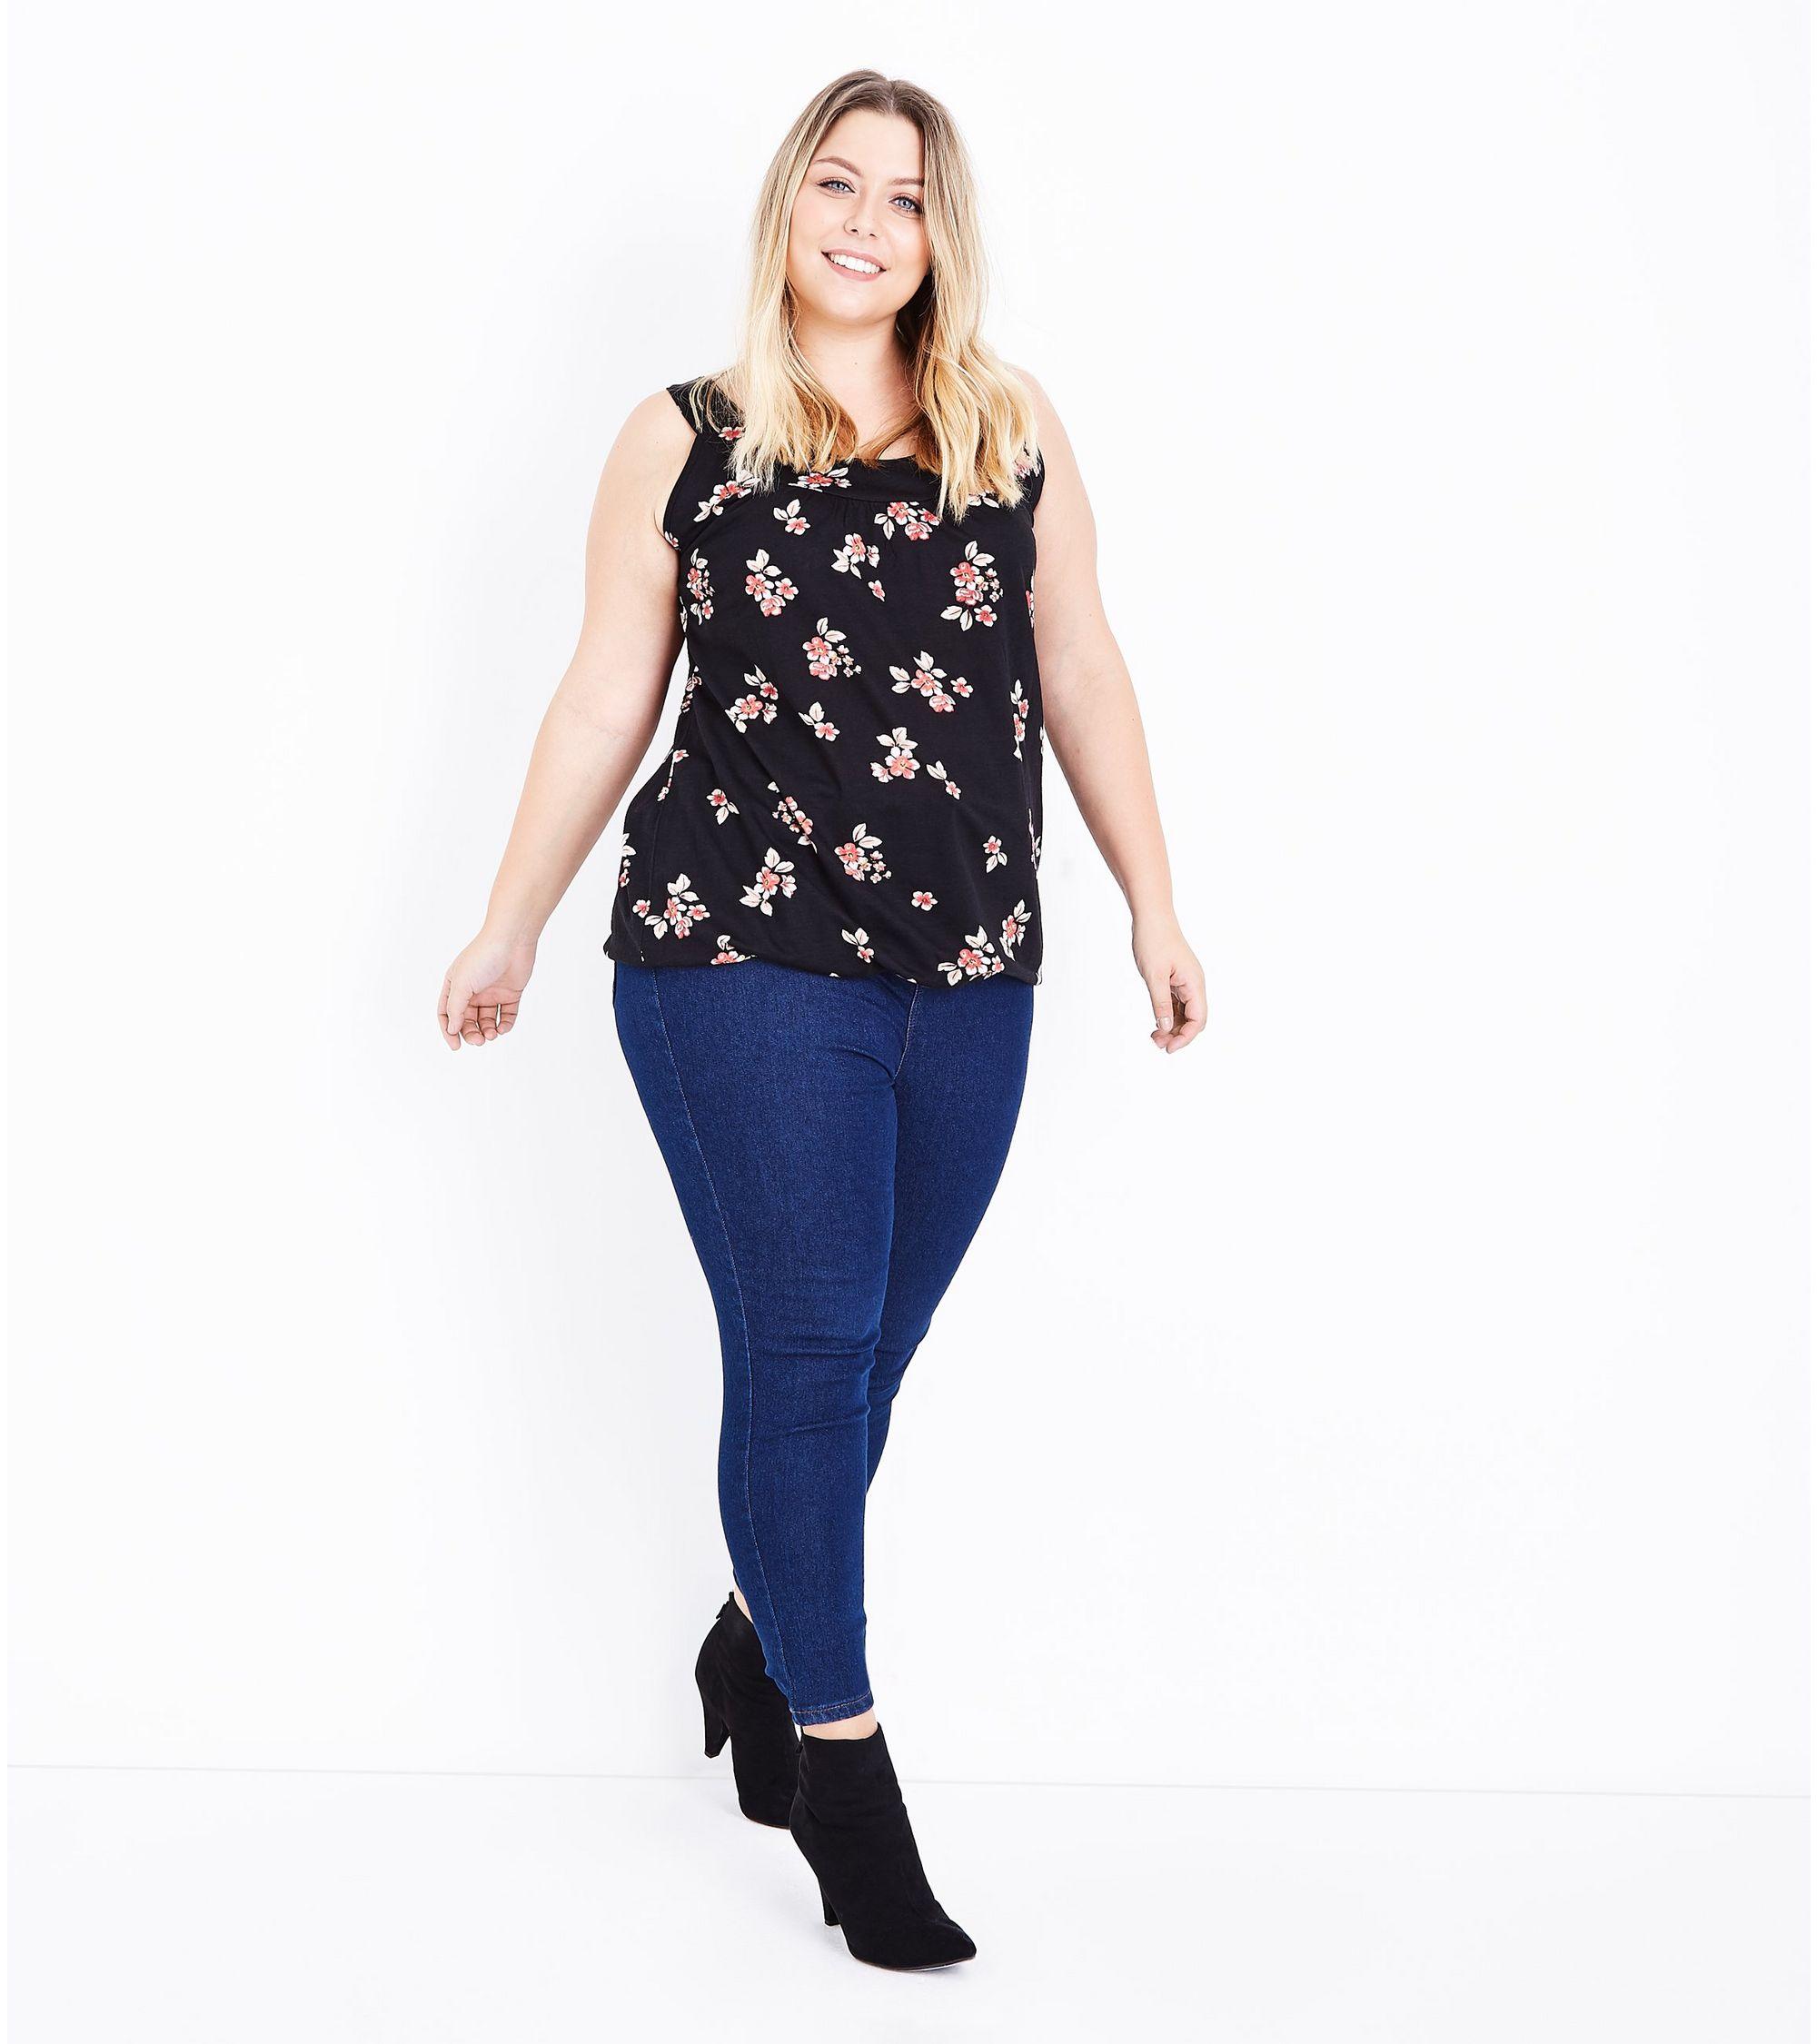 77beff71719e7b New Look Curves Black Floral Bubble Hem Vest at £6.99